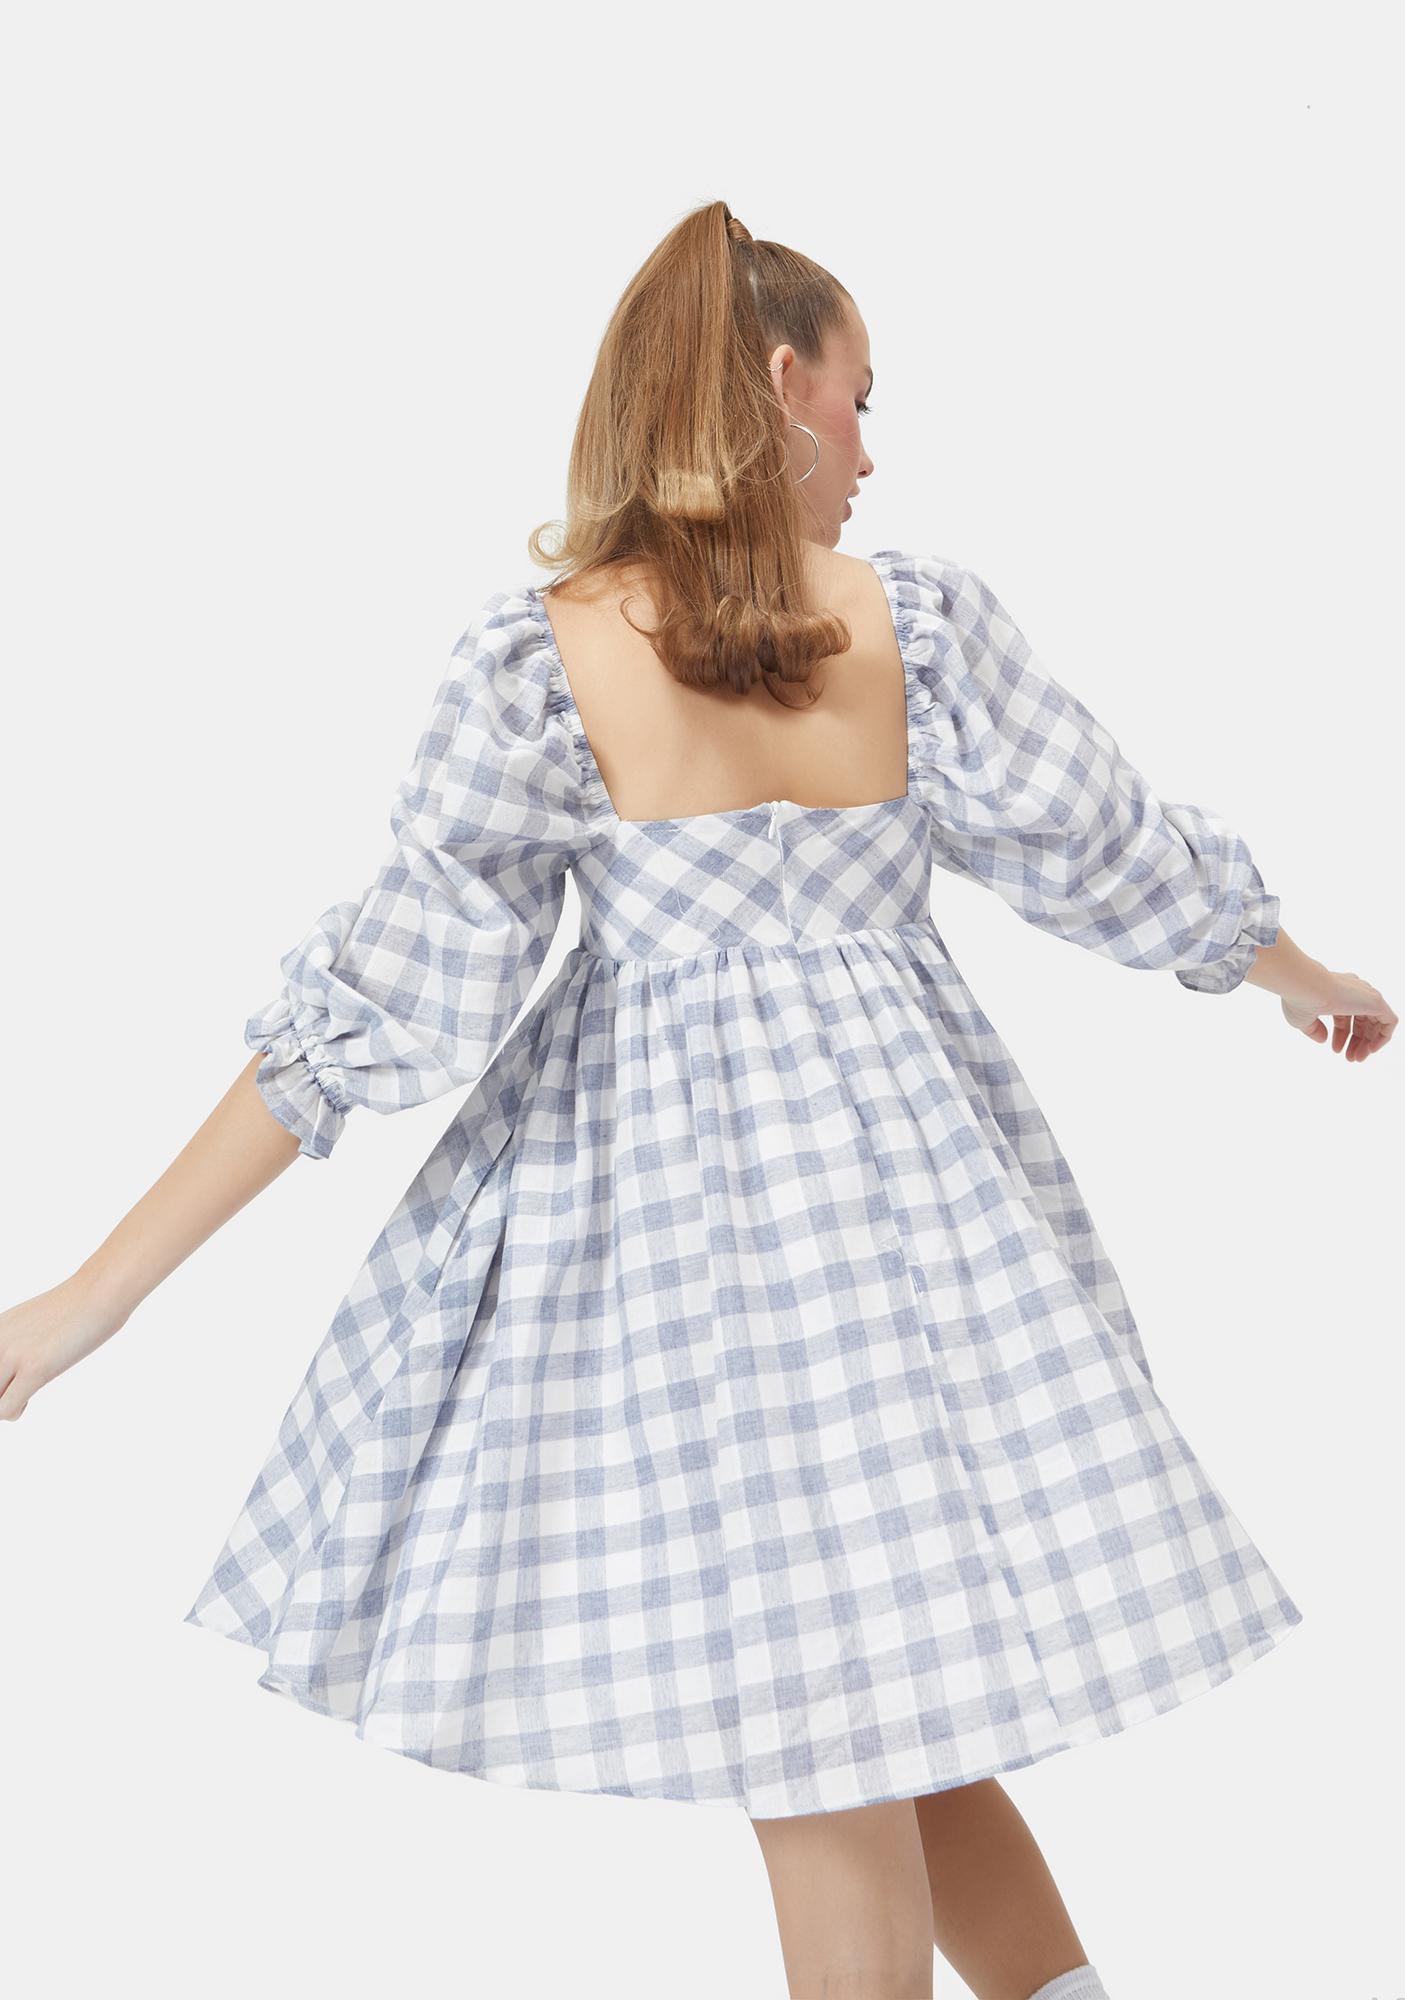 Chill Walk Me Home Gingham Babydoll Dress